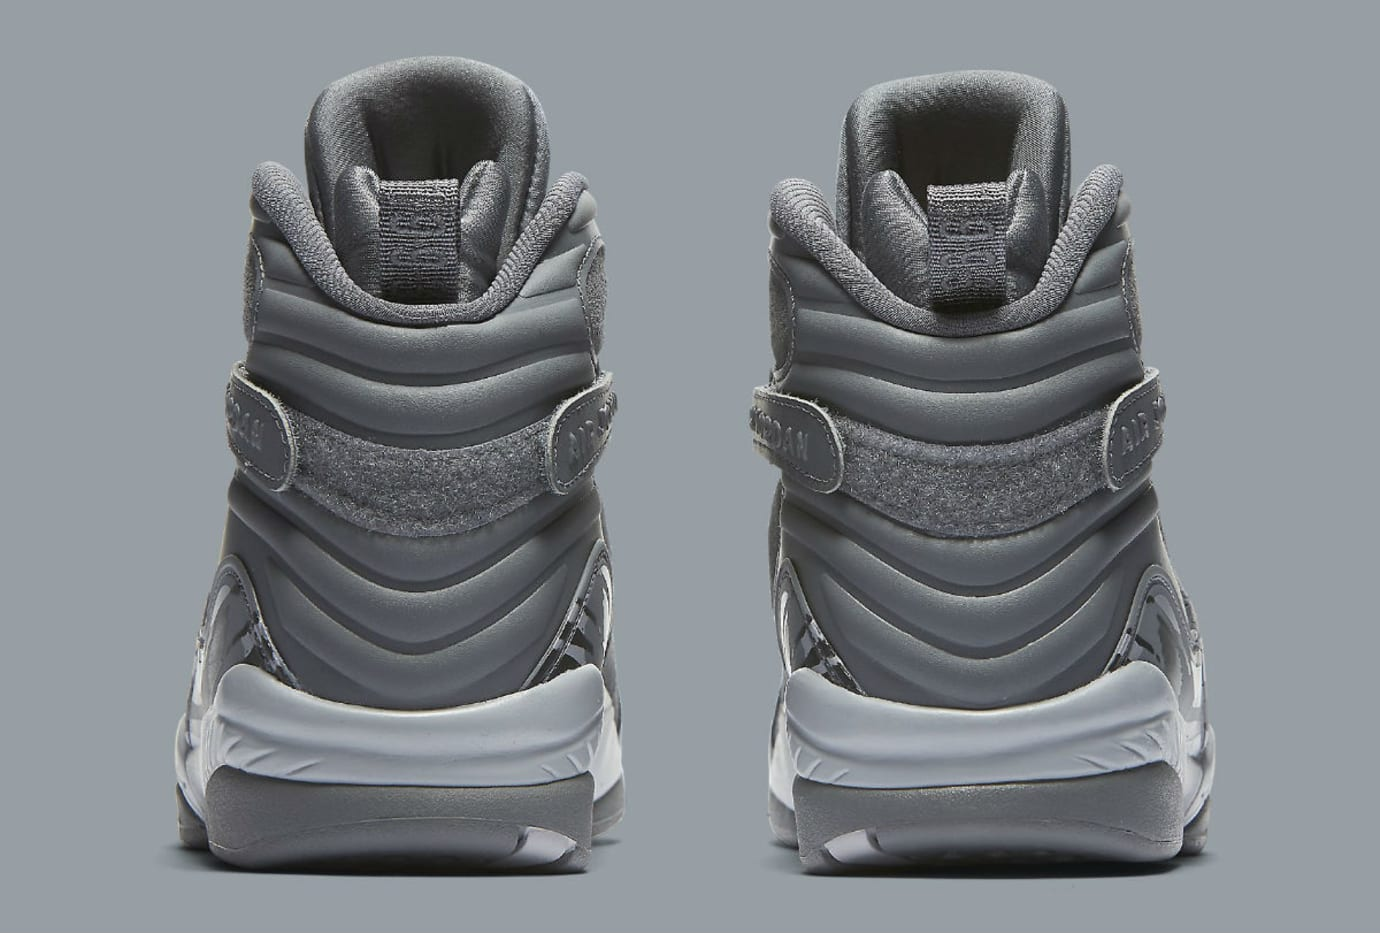 cc8ab789a9ca Air Jordan 8 VIII Cool Grey Release Date Heel 305381-014